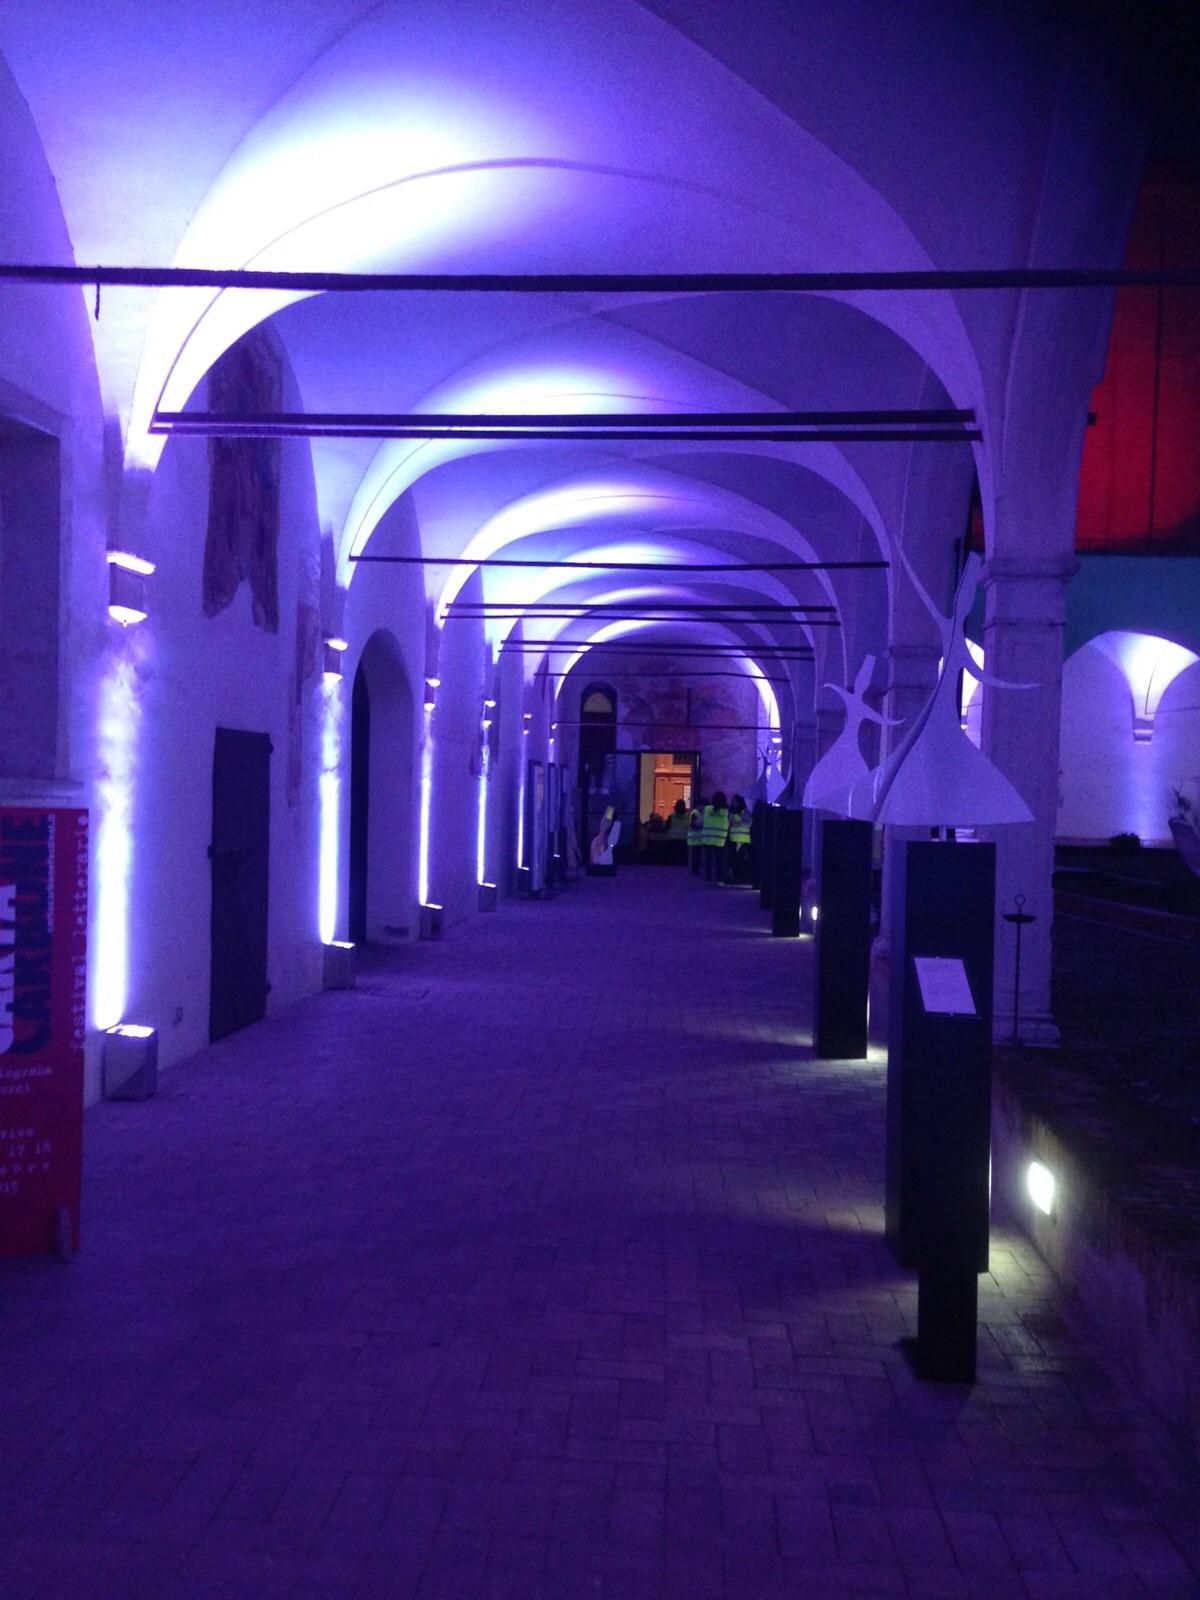 Museo Santa Caterina treviso Mind srl illumina carta carbone festival letterario